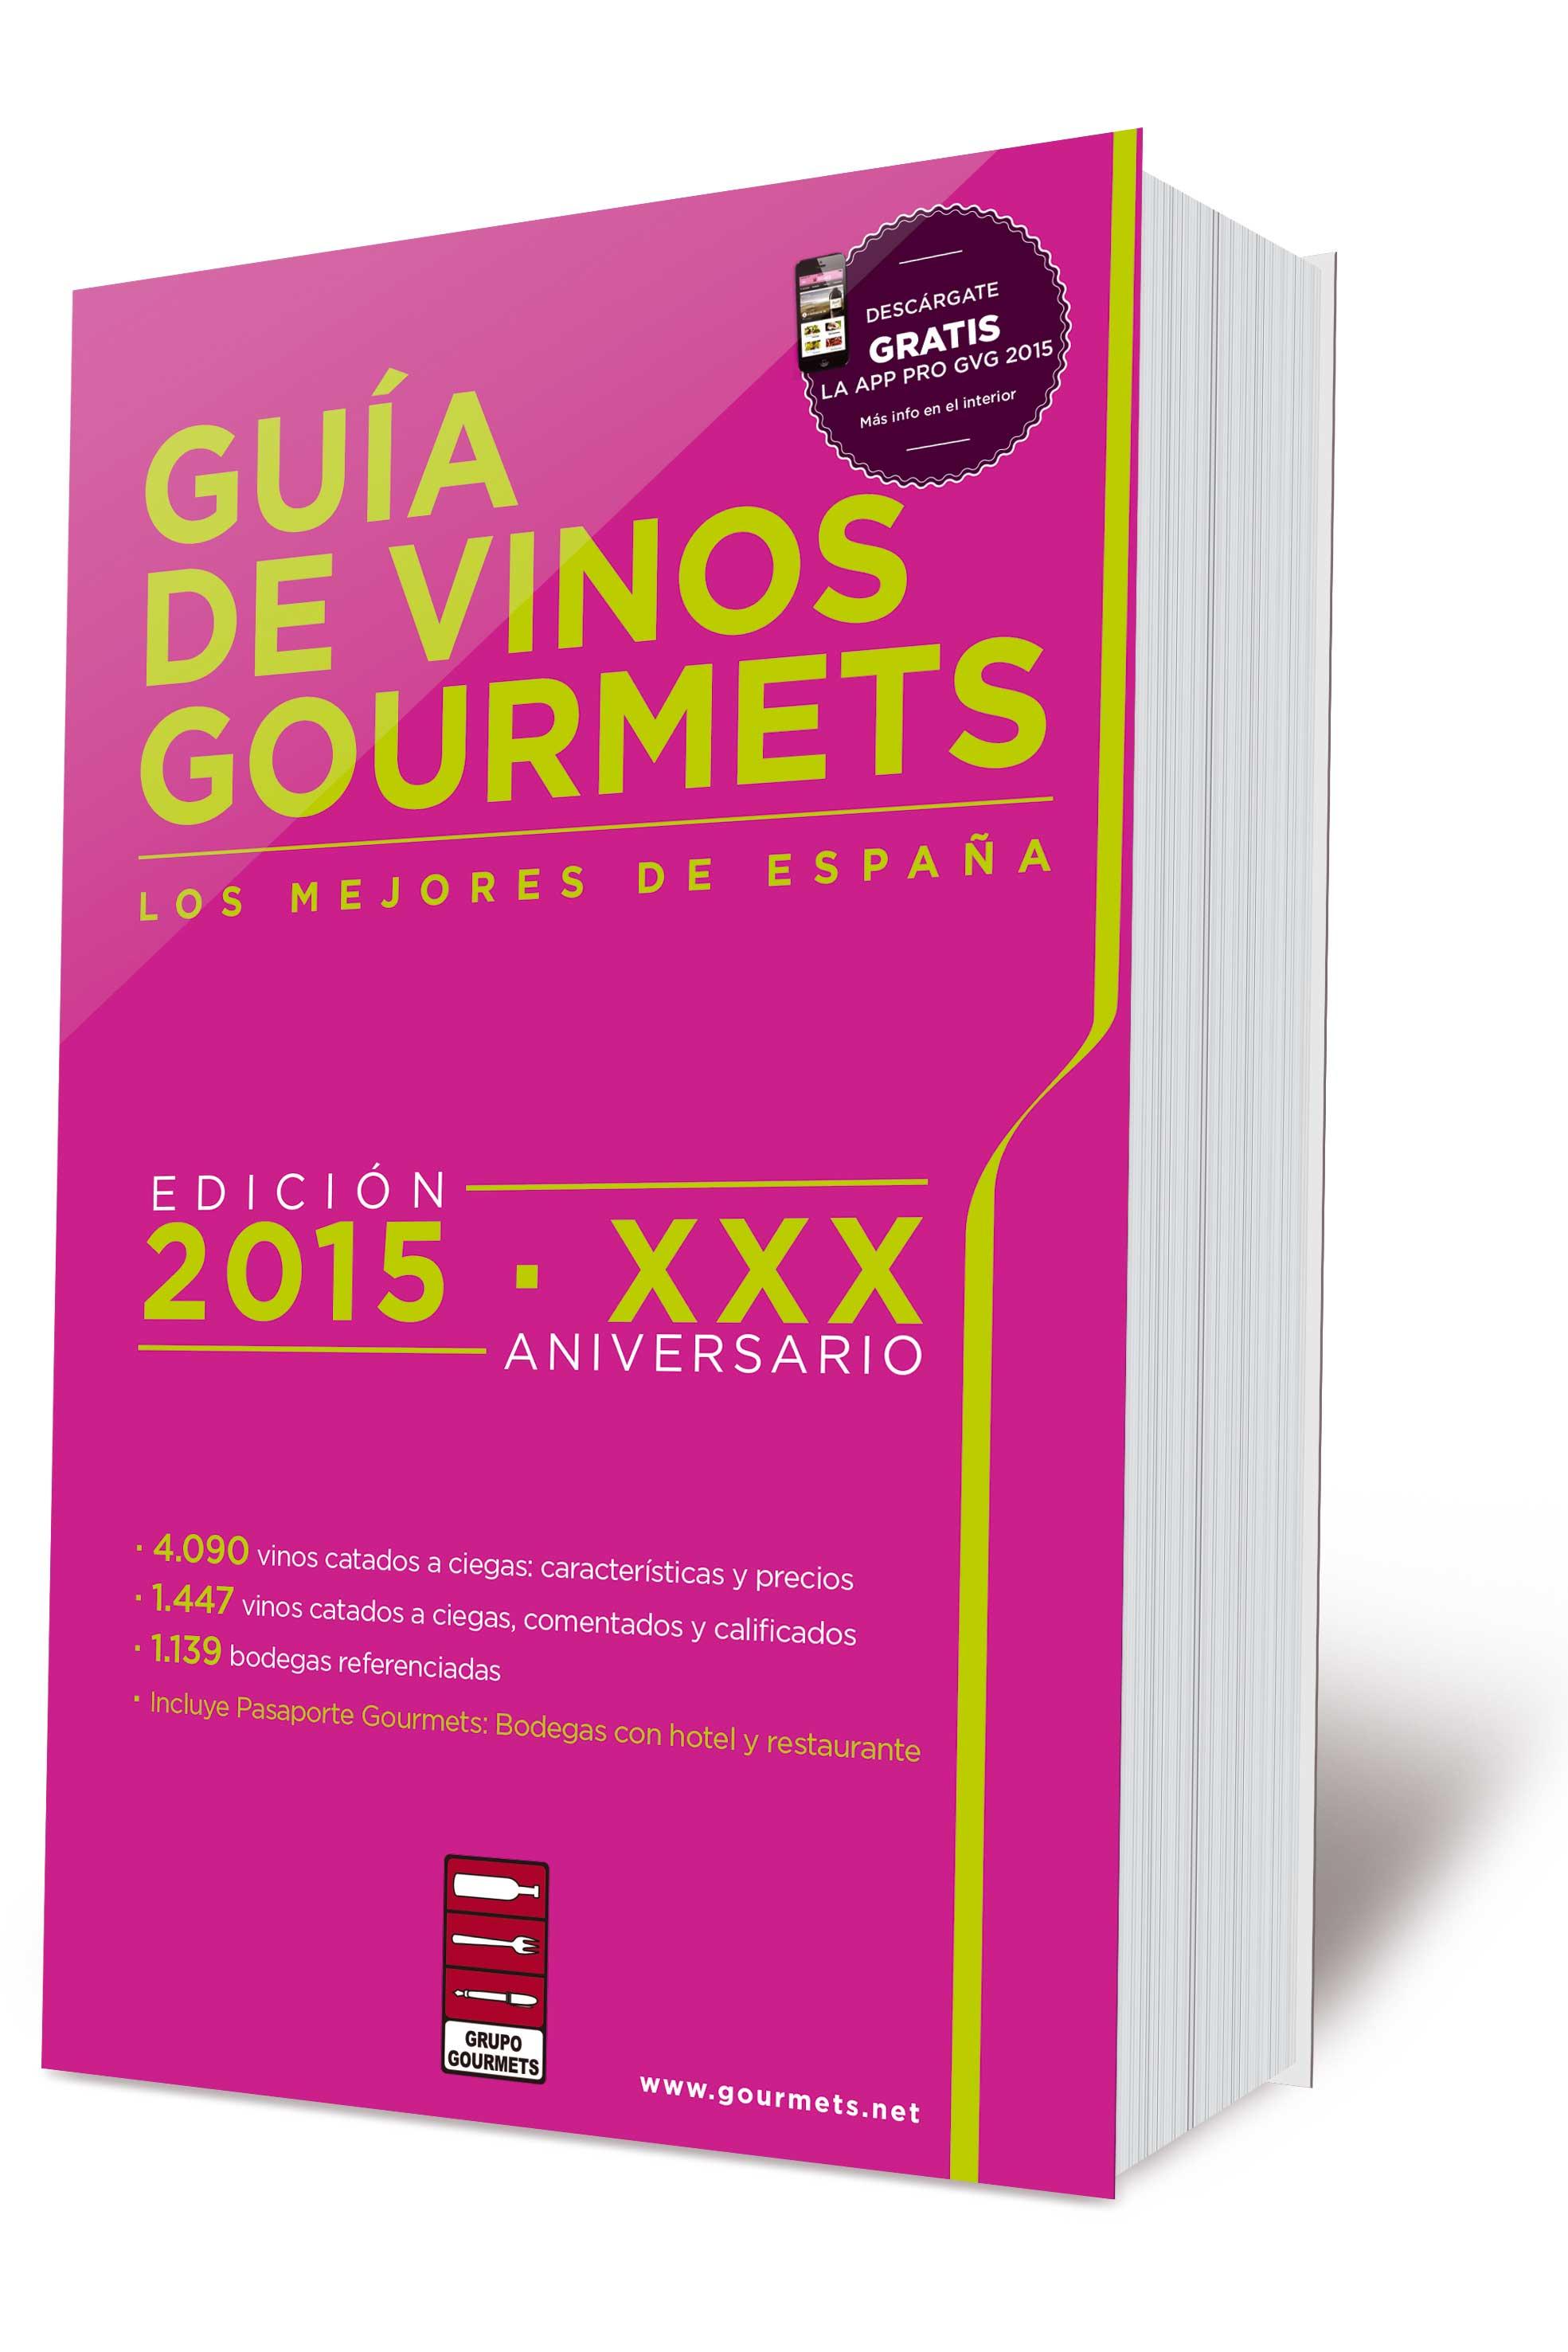 GuiaGourmets.jpg